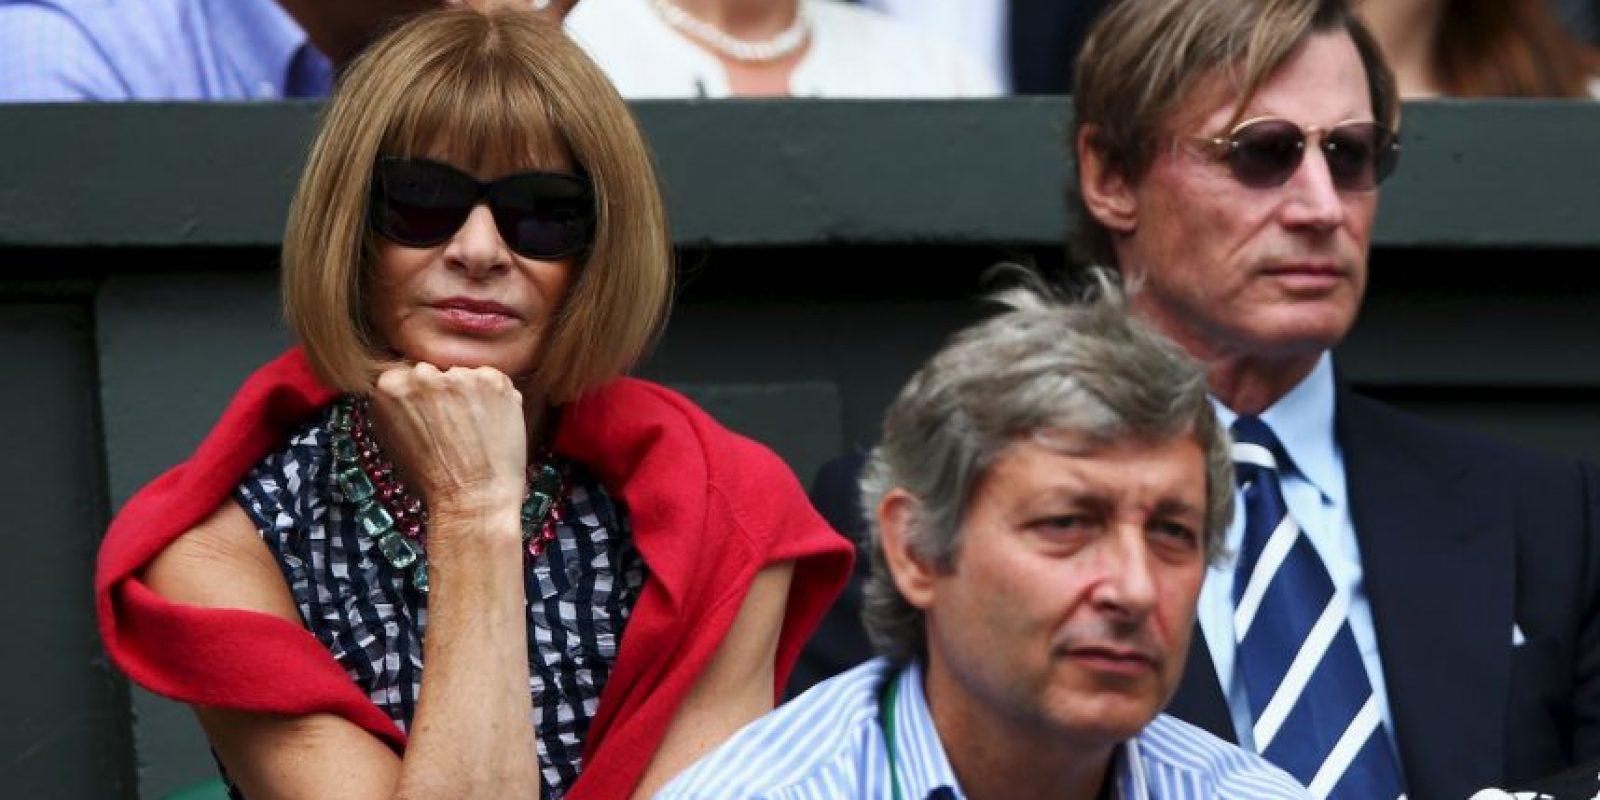 Anna Wintour, editora de Vogue, también llenó de glamour el All England Club. Foto:Getty Images